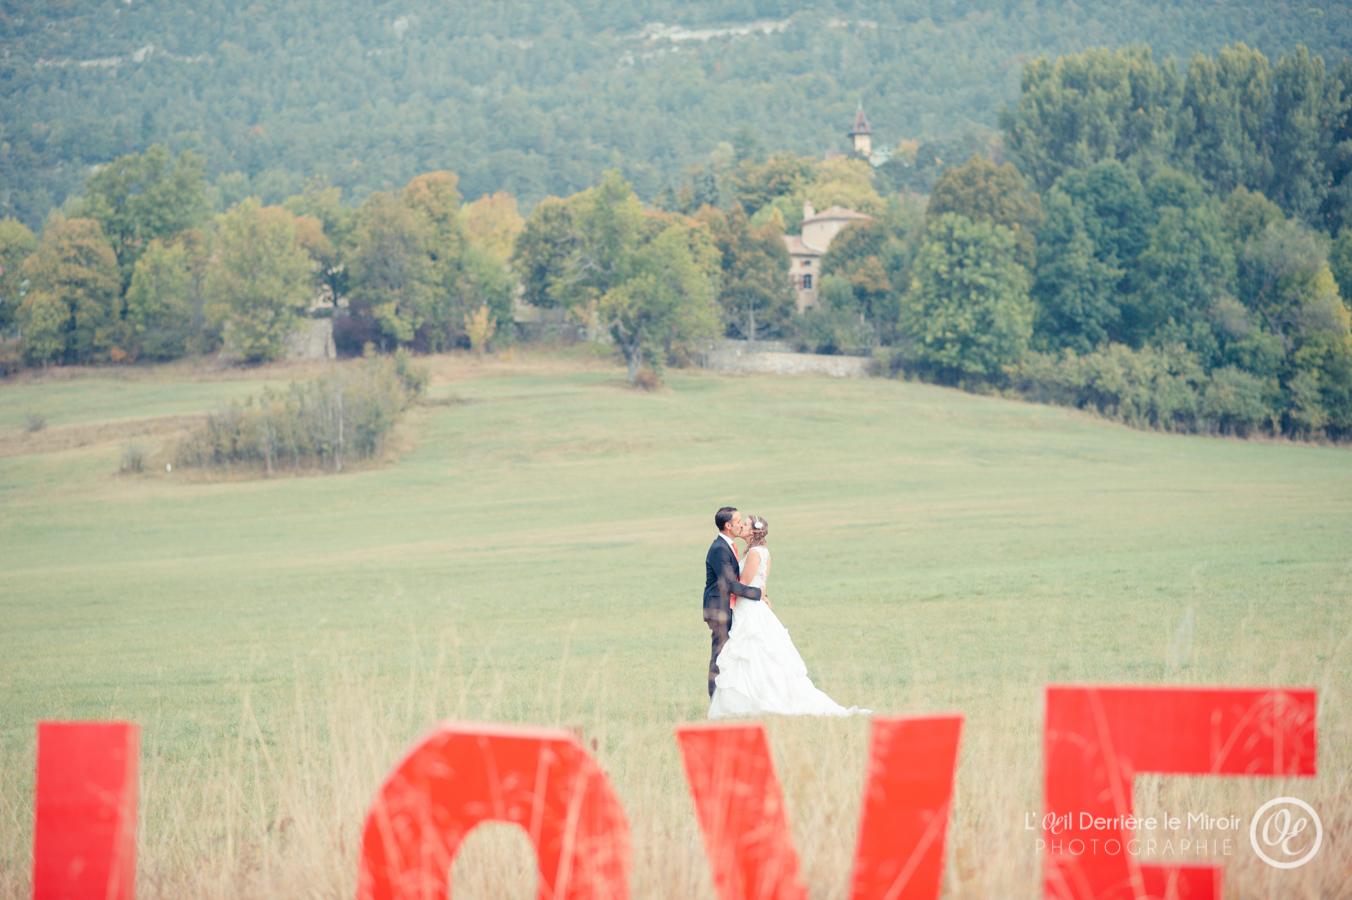 After-wedding-Audrey-Luis-loeilderrierelemiroir-02